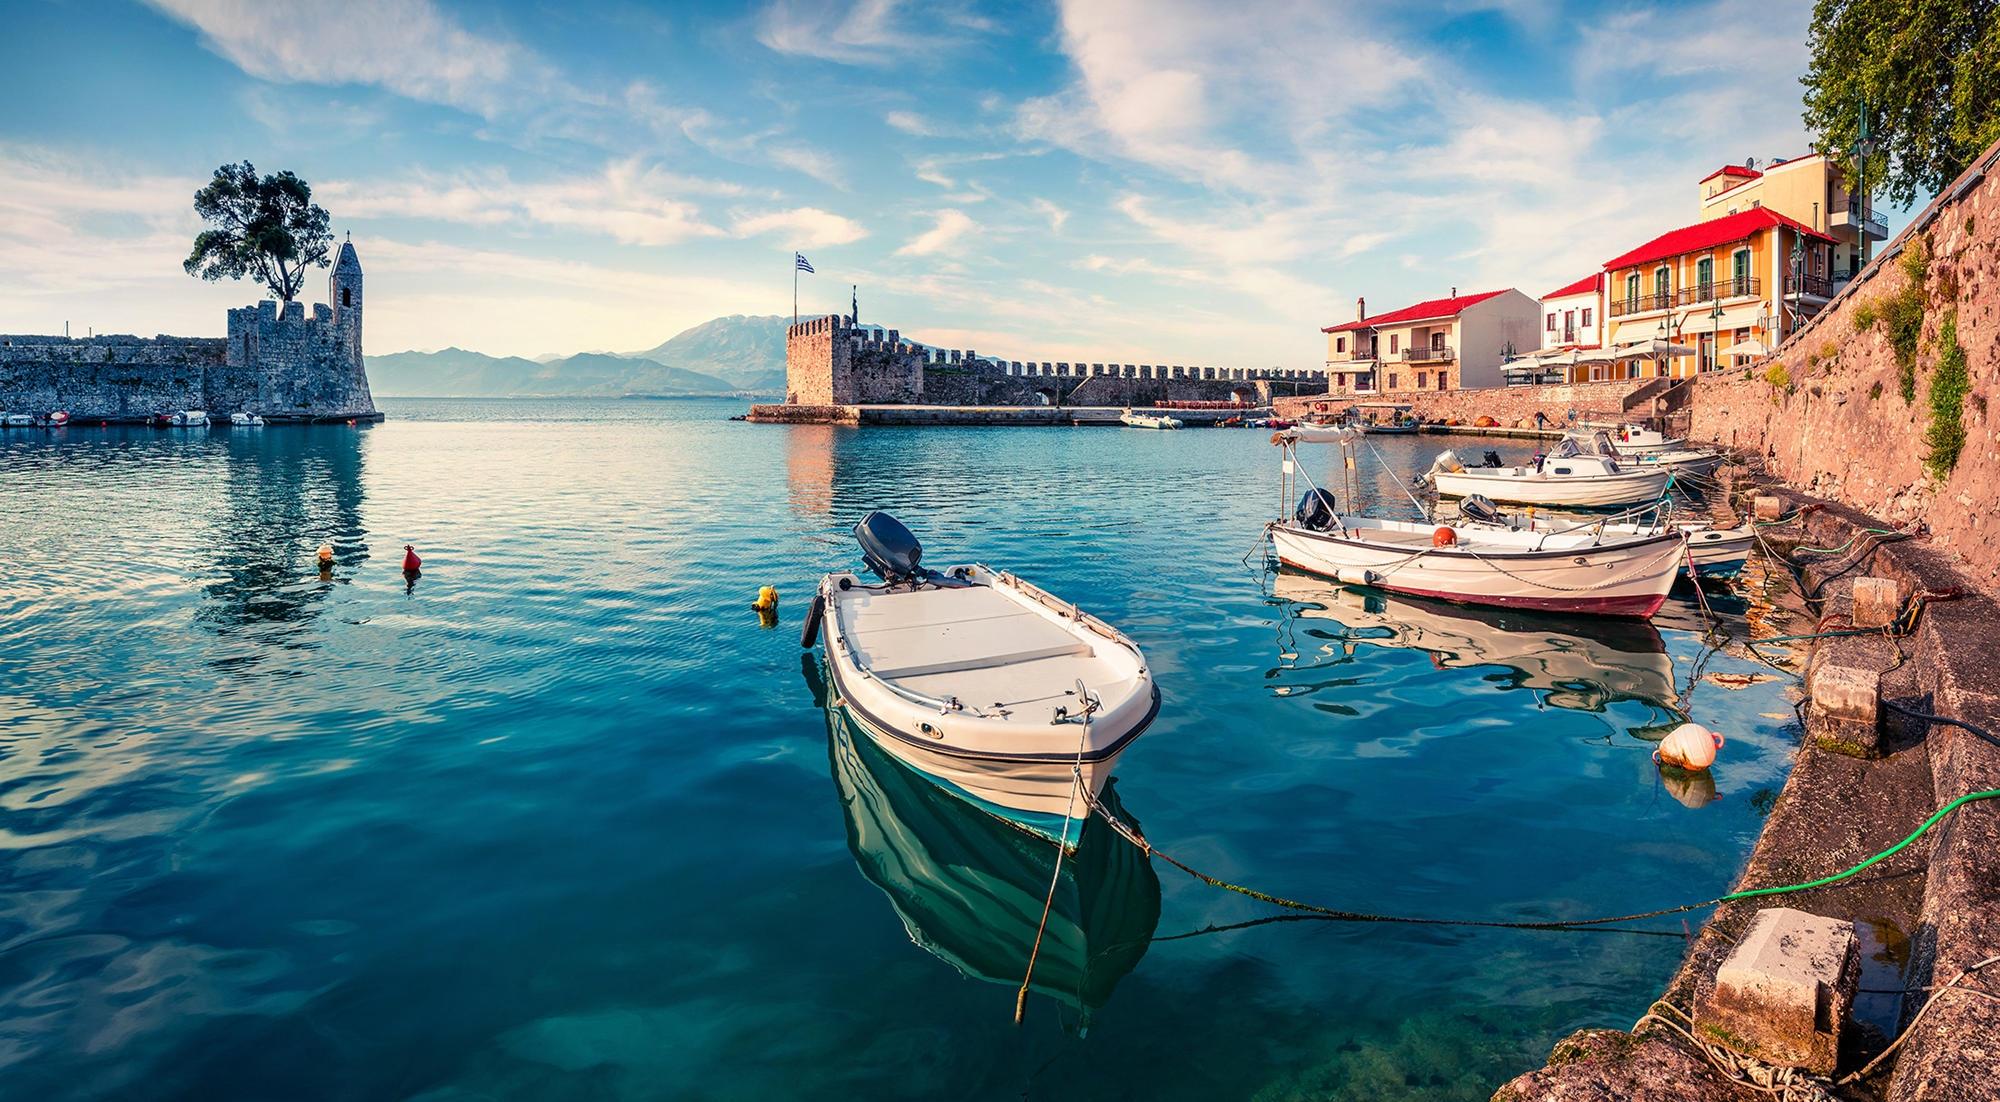 Nafpaktos, Greece - Discover Greece in 7 days tour from Igoumenitsa. Ancient towns, beaches, castles and monasteries. Monterrasol Travel tour with small group minivan.